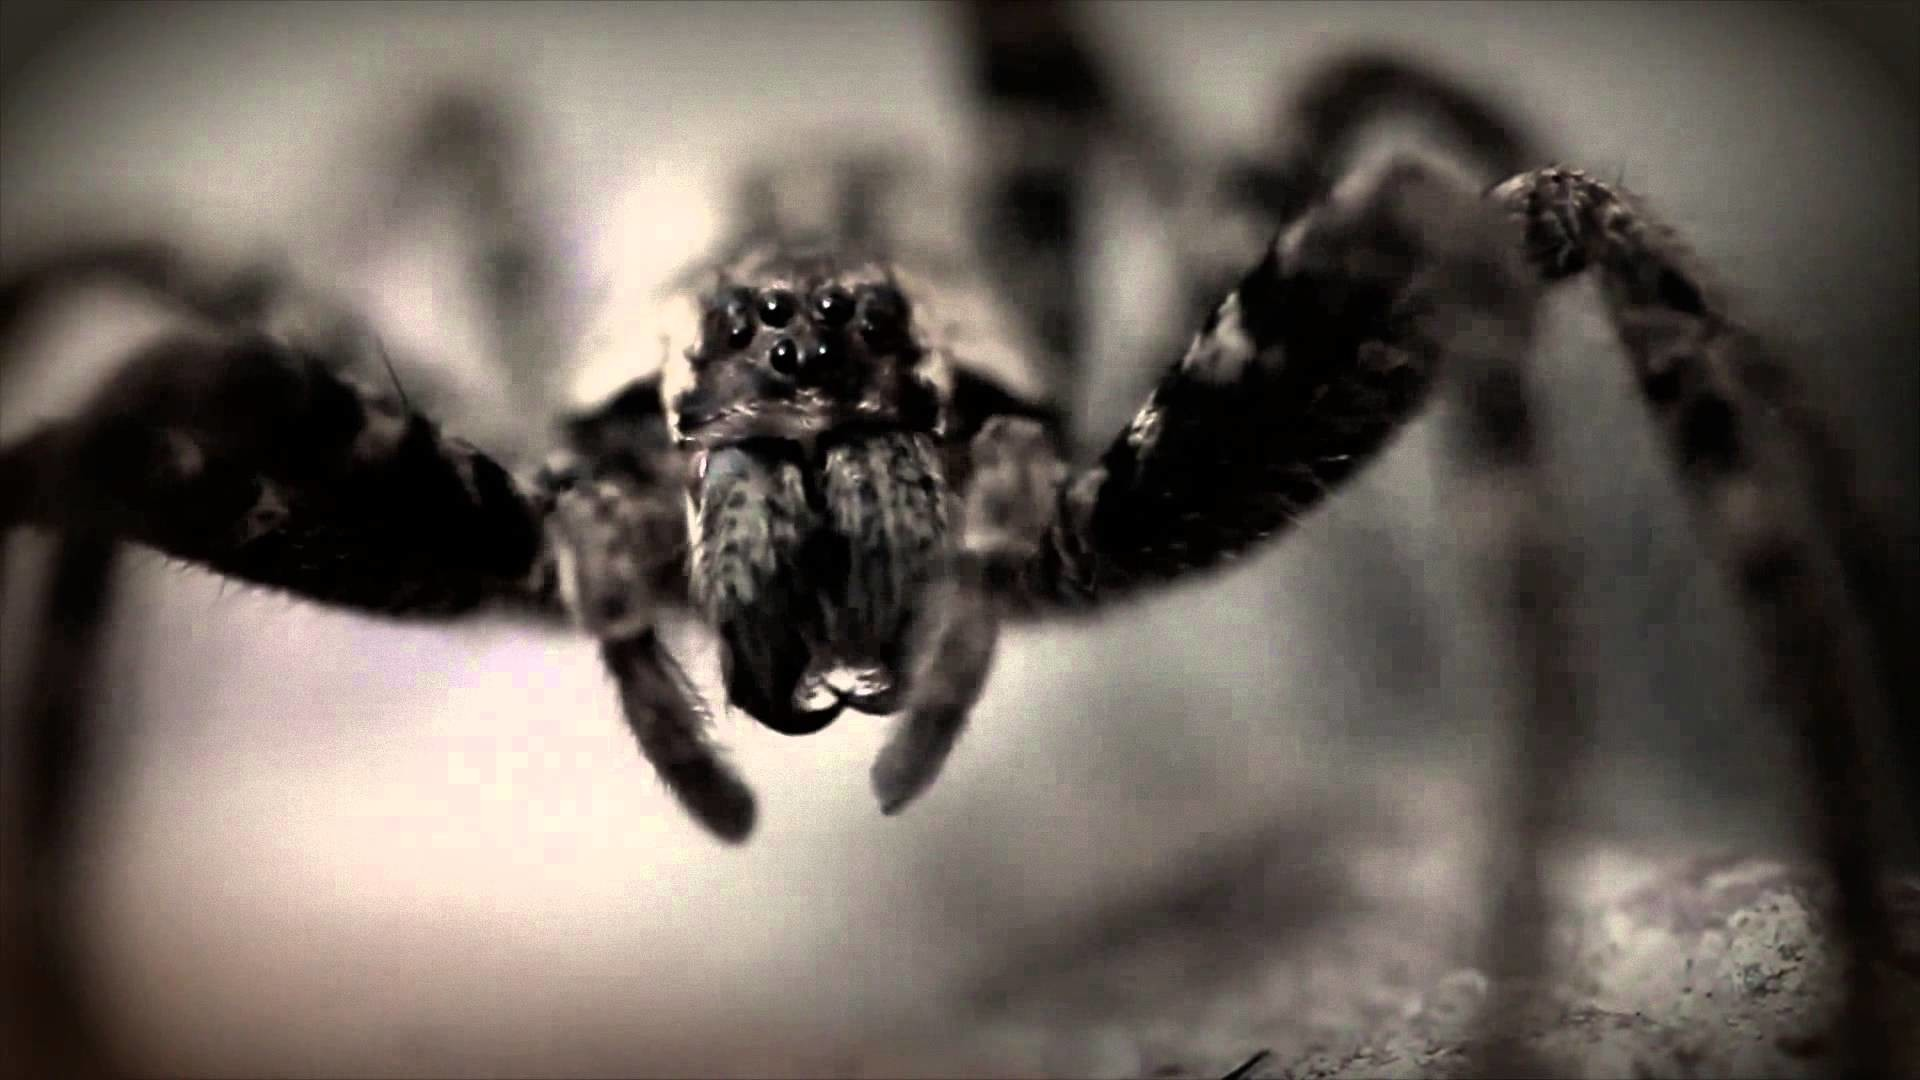 Creepy Spiders and Creepy Music